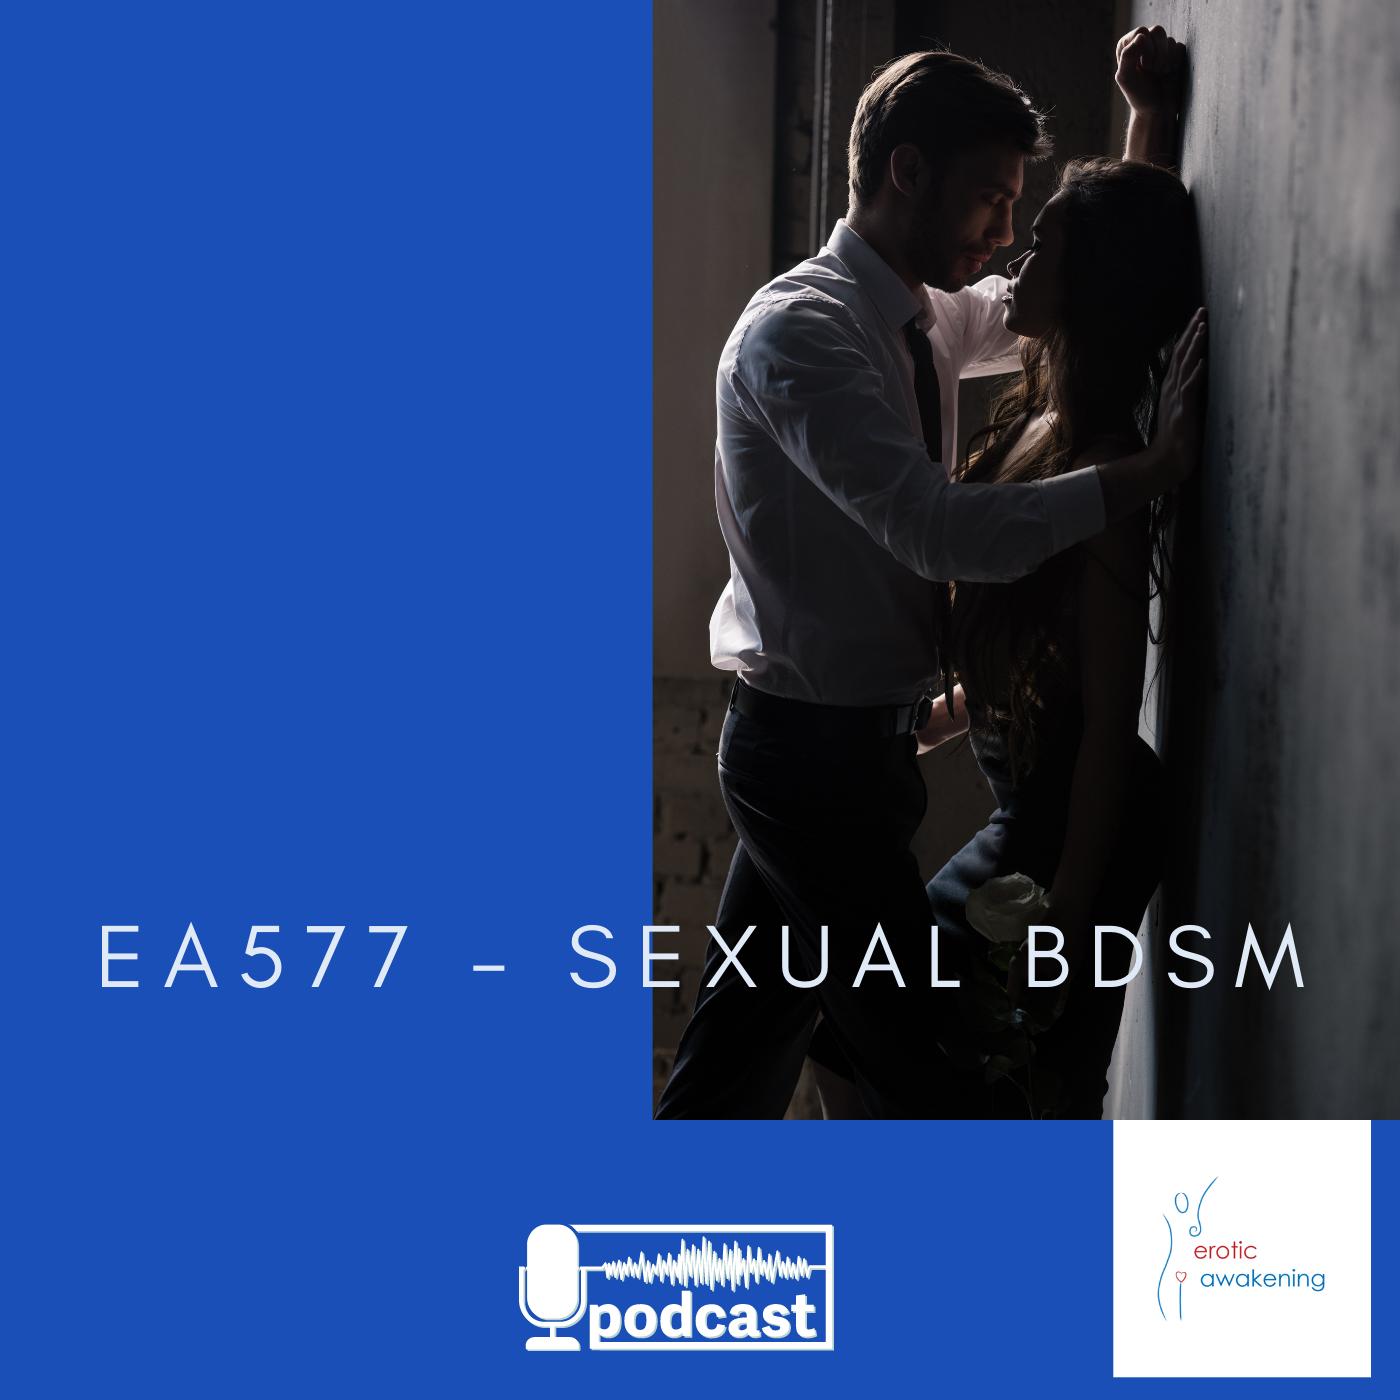 Erotic Awakening Podcast - EA577 - Sexual BDSM